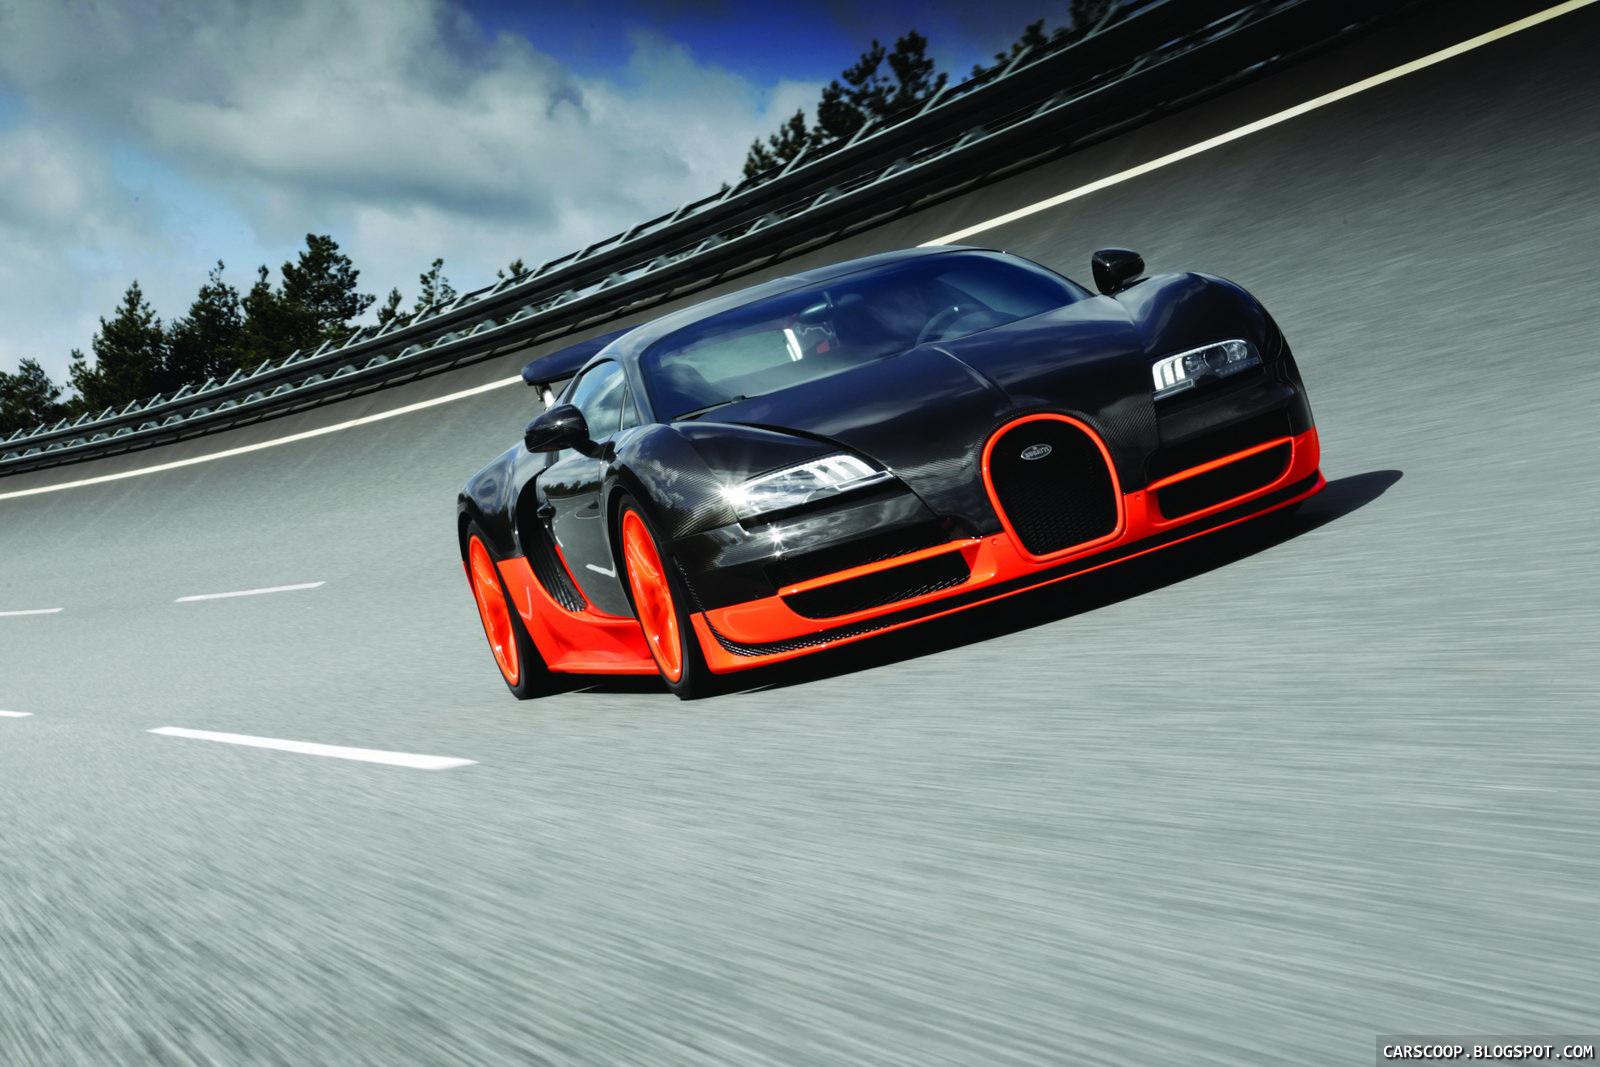 new bugatti veyron 16 4 super sport 1 200hp and 415km h. Black Bedroom Furniture Sets. Home Design Ideas